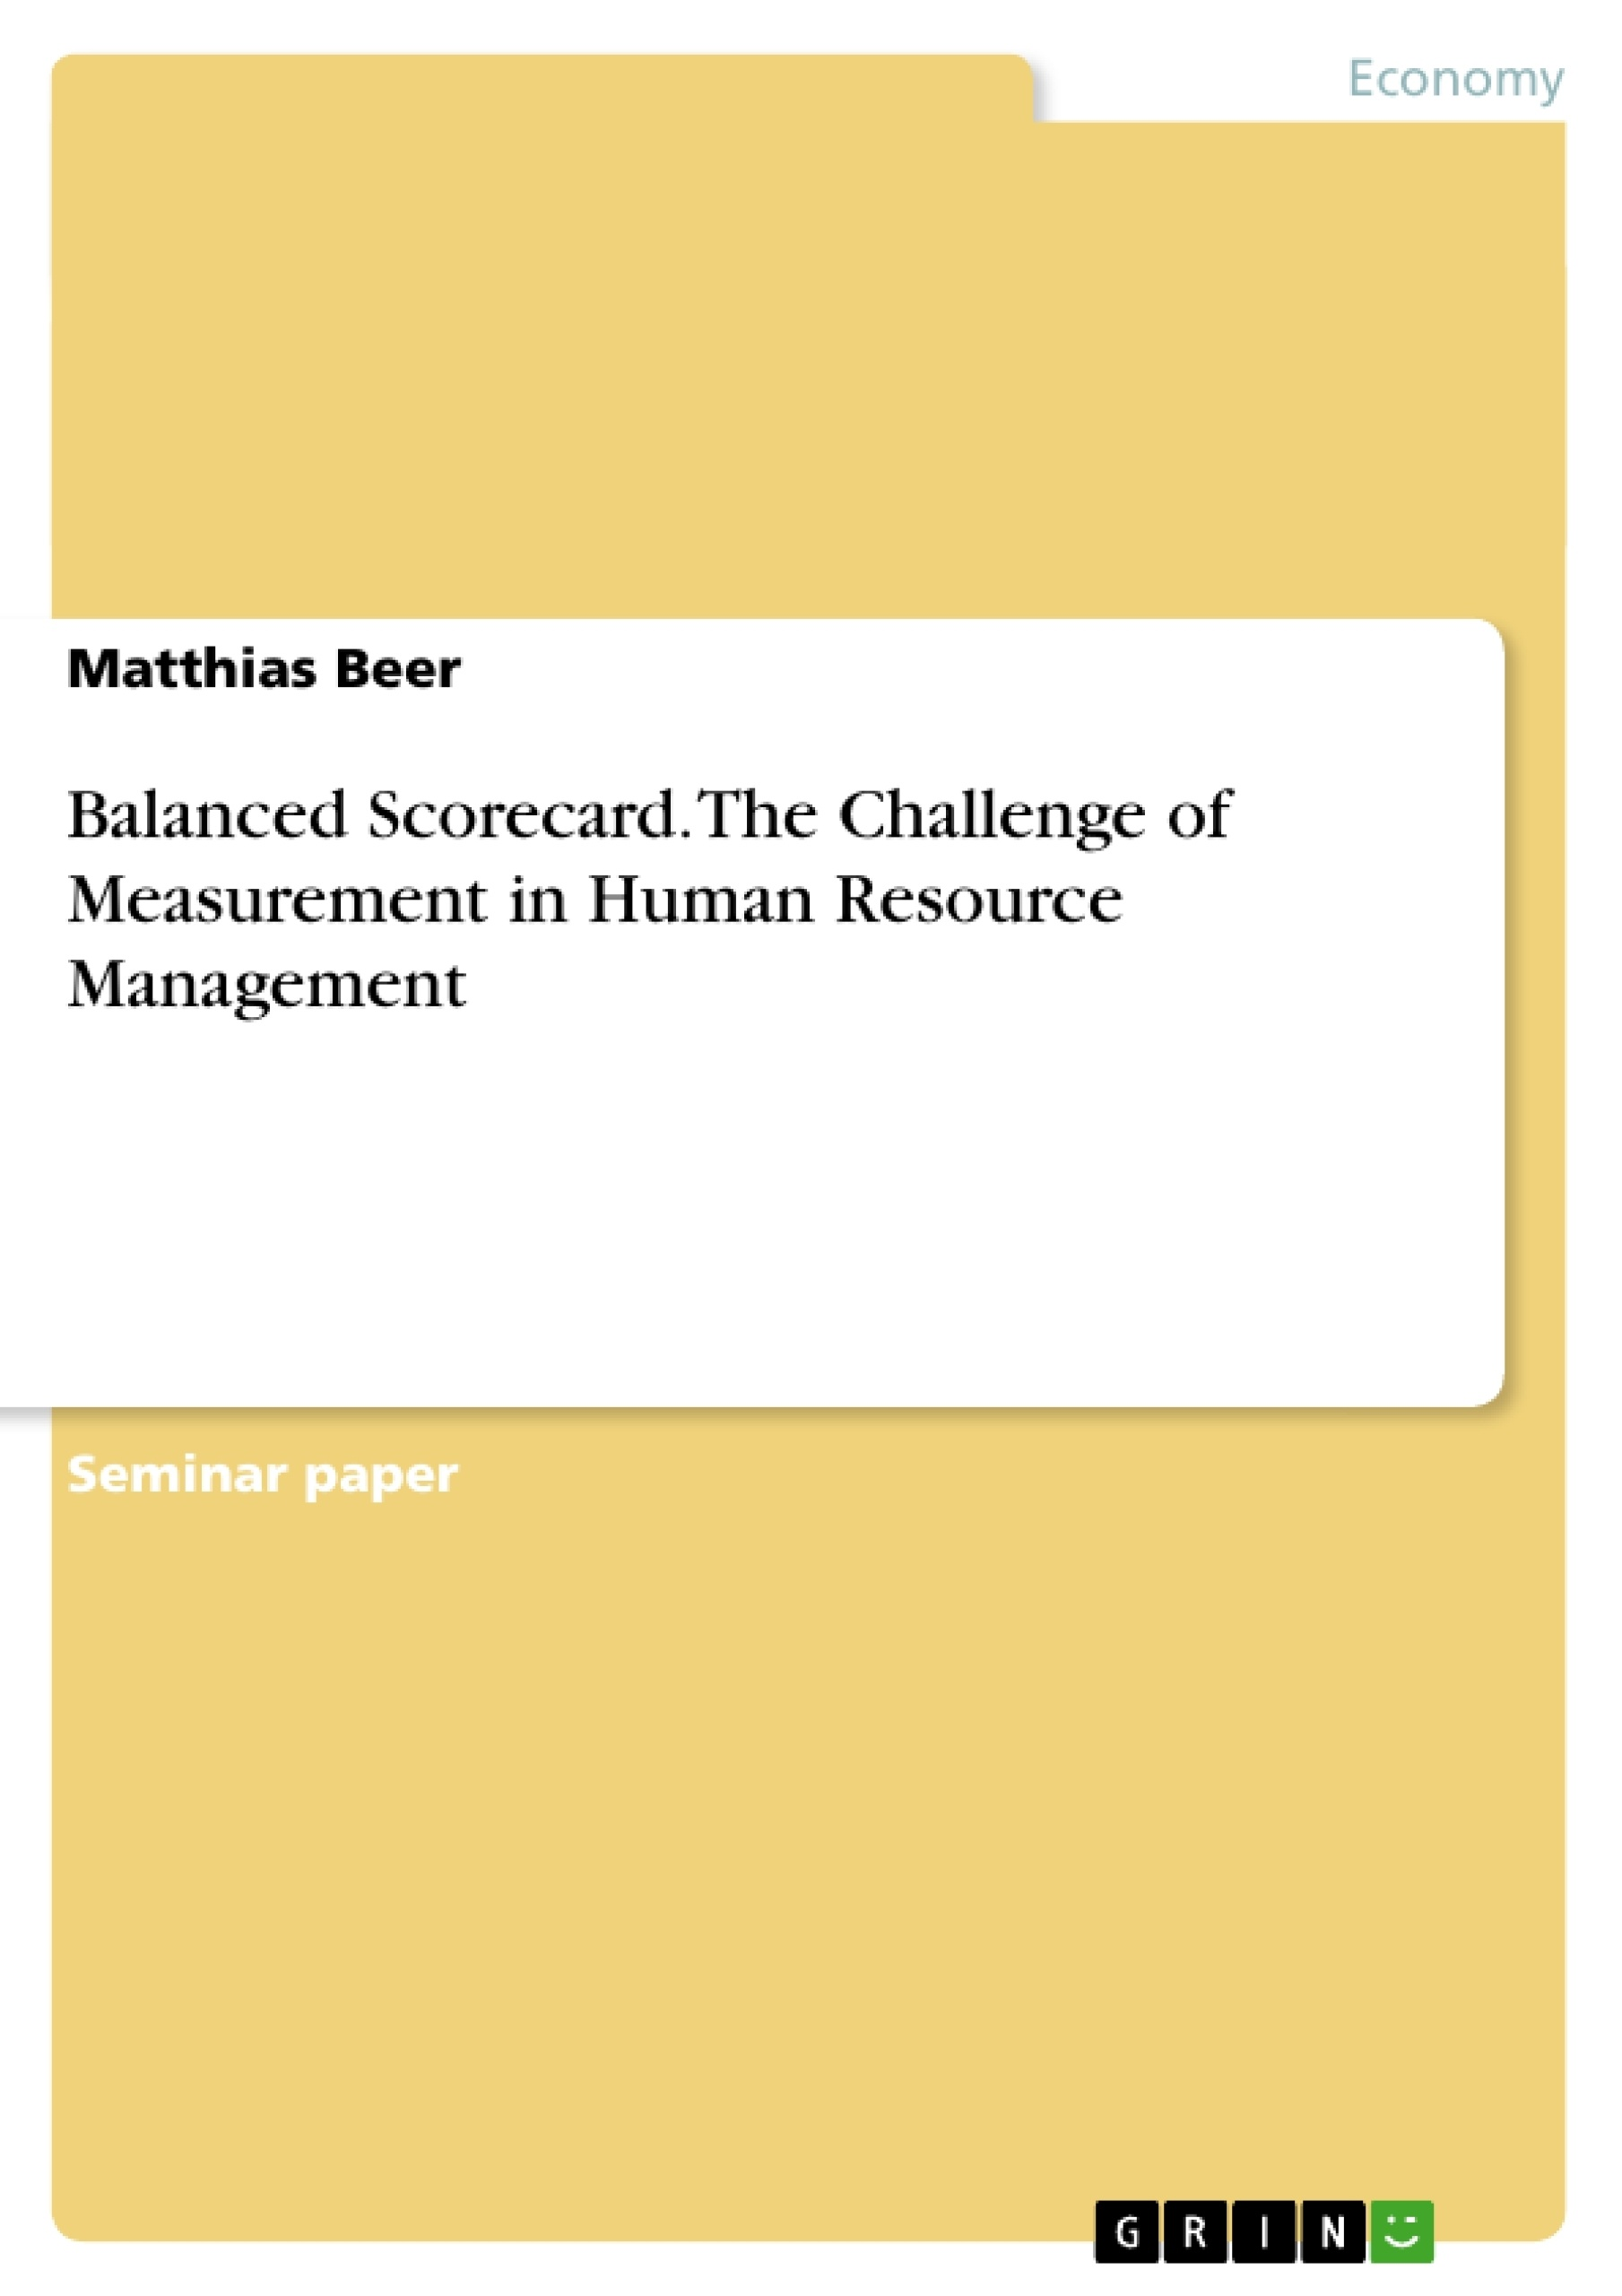 Title: Balanced Scorecard. The Challenge of Measurement in Human Resource Management